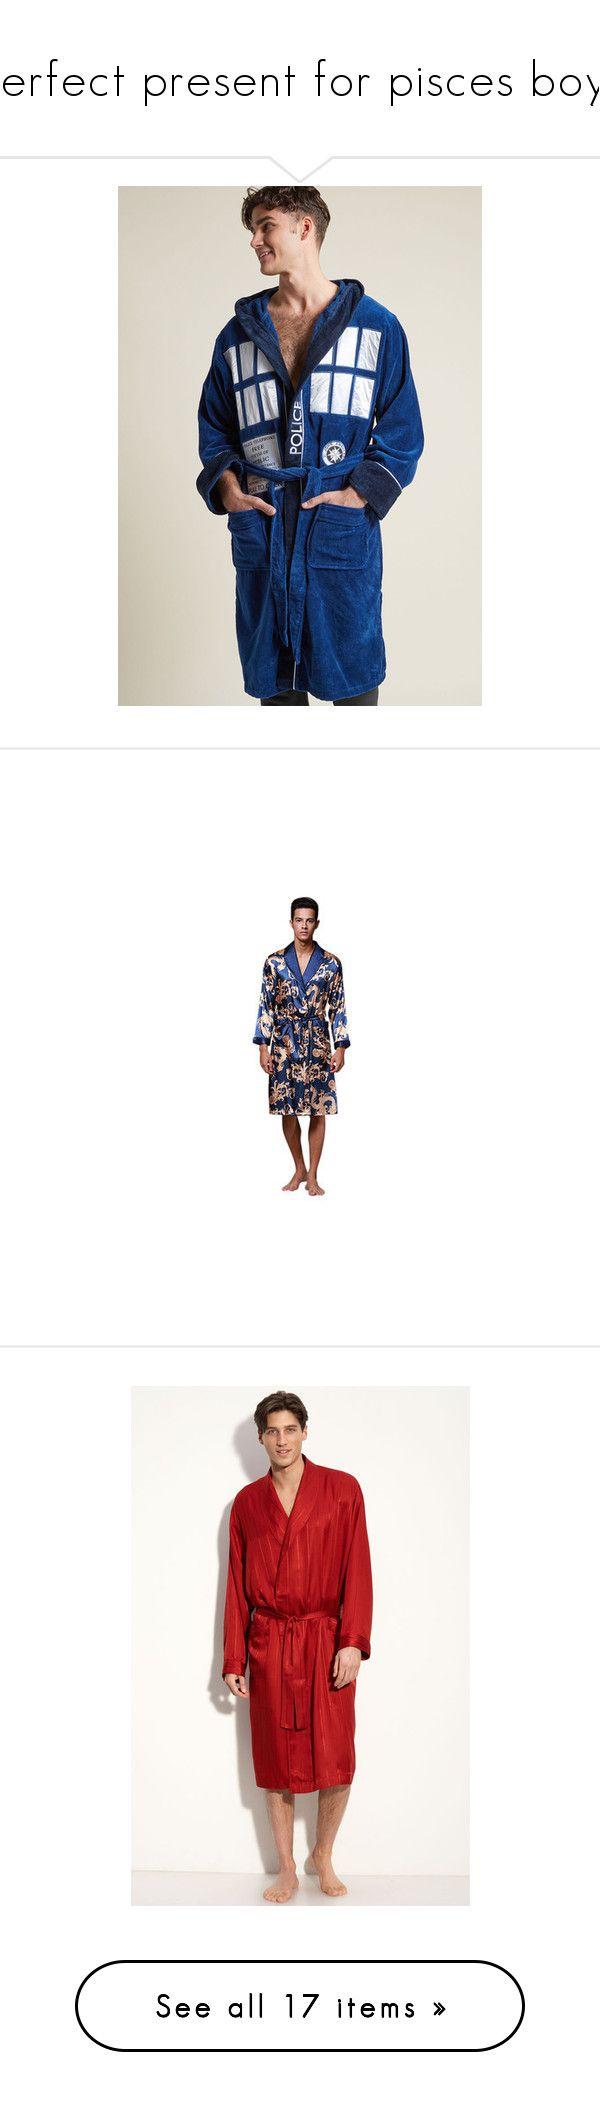 """perfect present for pisces boys"" by cynthiadasmir2 on Polyvore featuring men's fashion, men's clothing, men's sleepwear, men sleepwear pajamas, royal blue, mens silk bathrobe, men's apparel, mens silk sleepwear, mens clothing and mahogany"